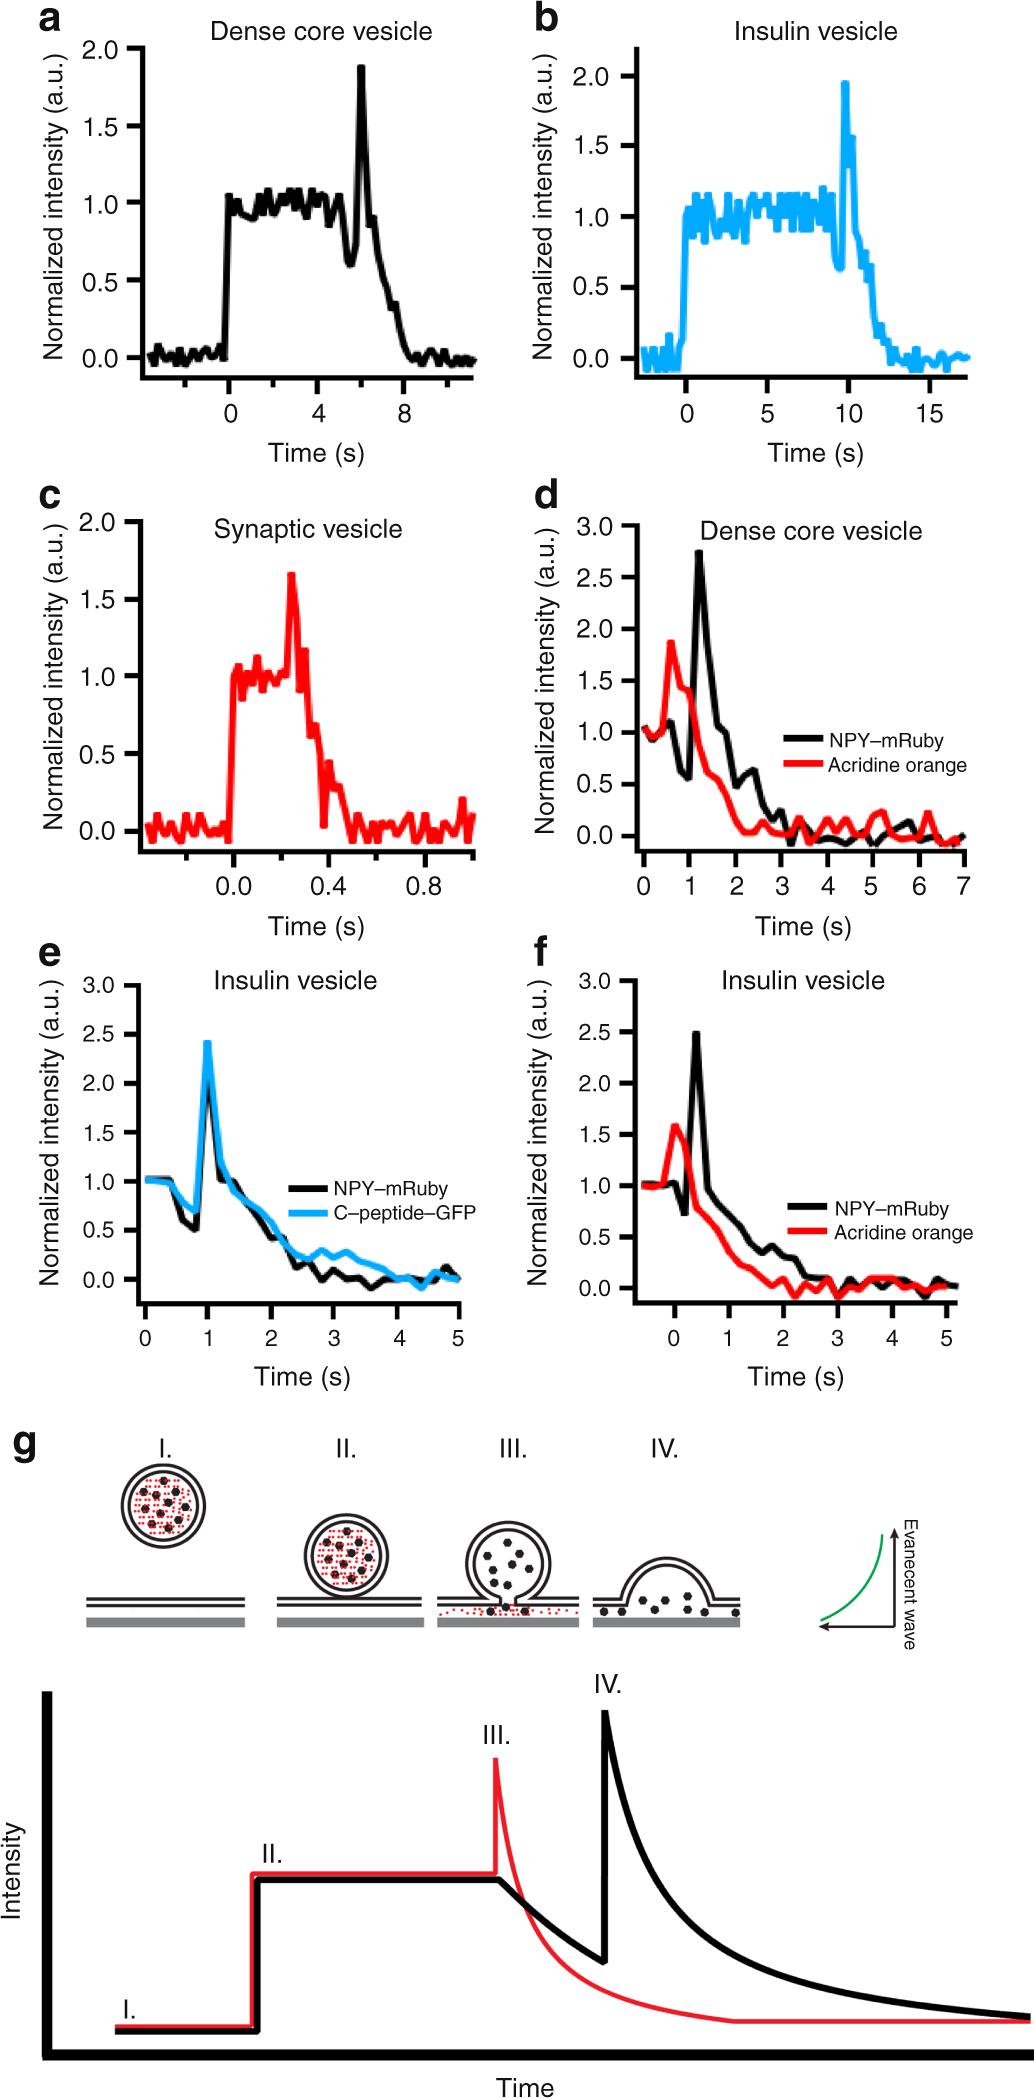 In vitro fusion of single synaptic and dense core vesicles